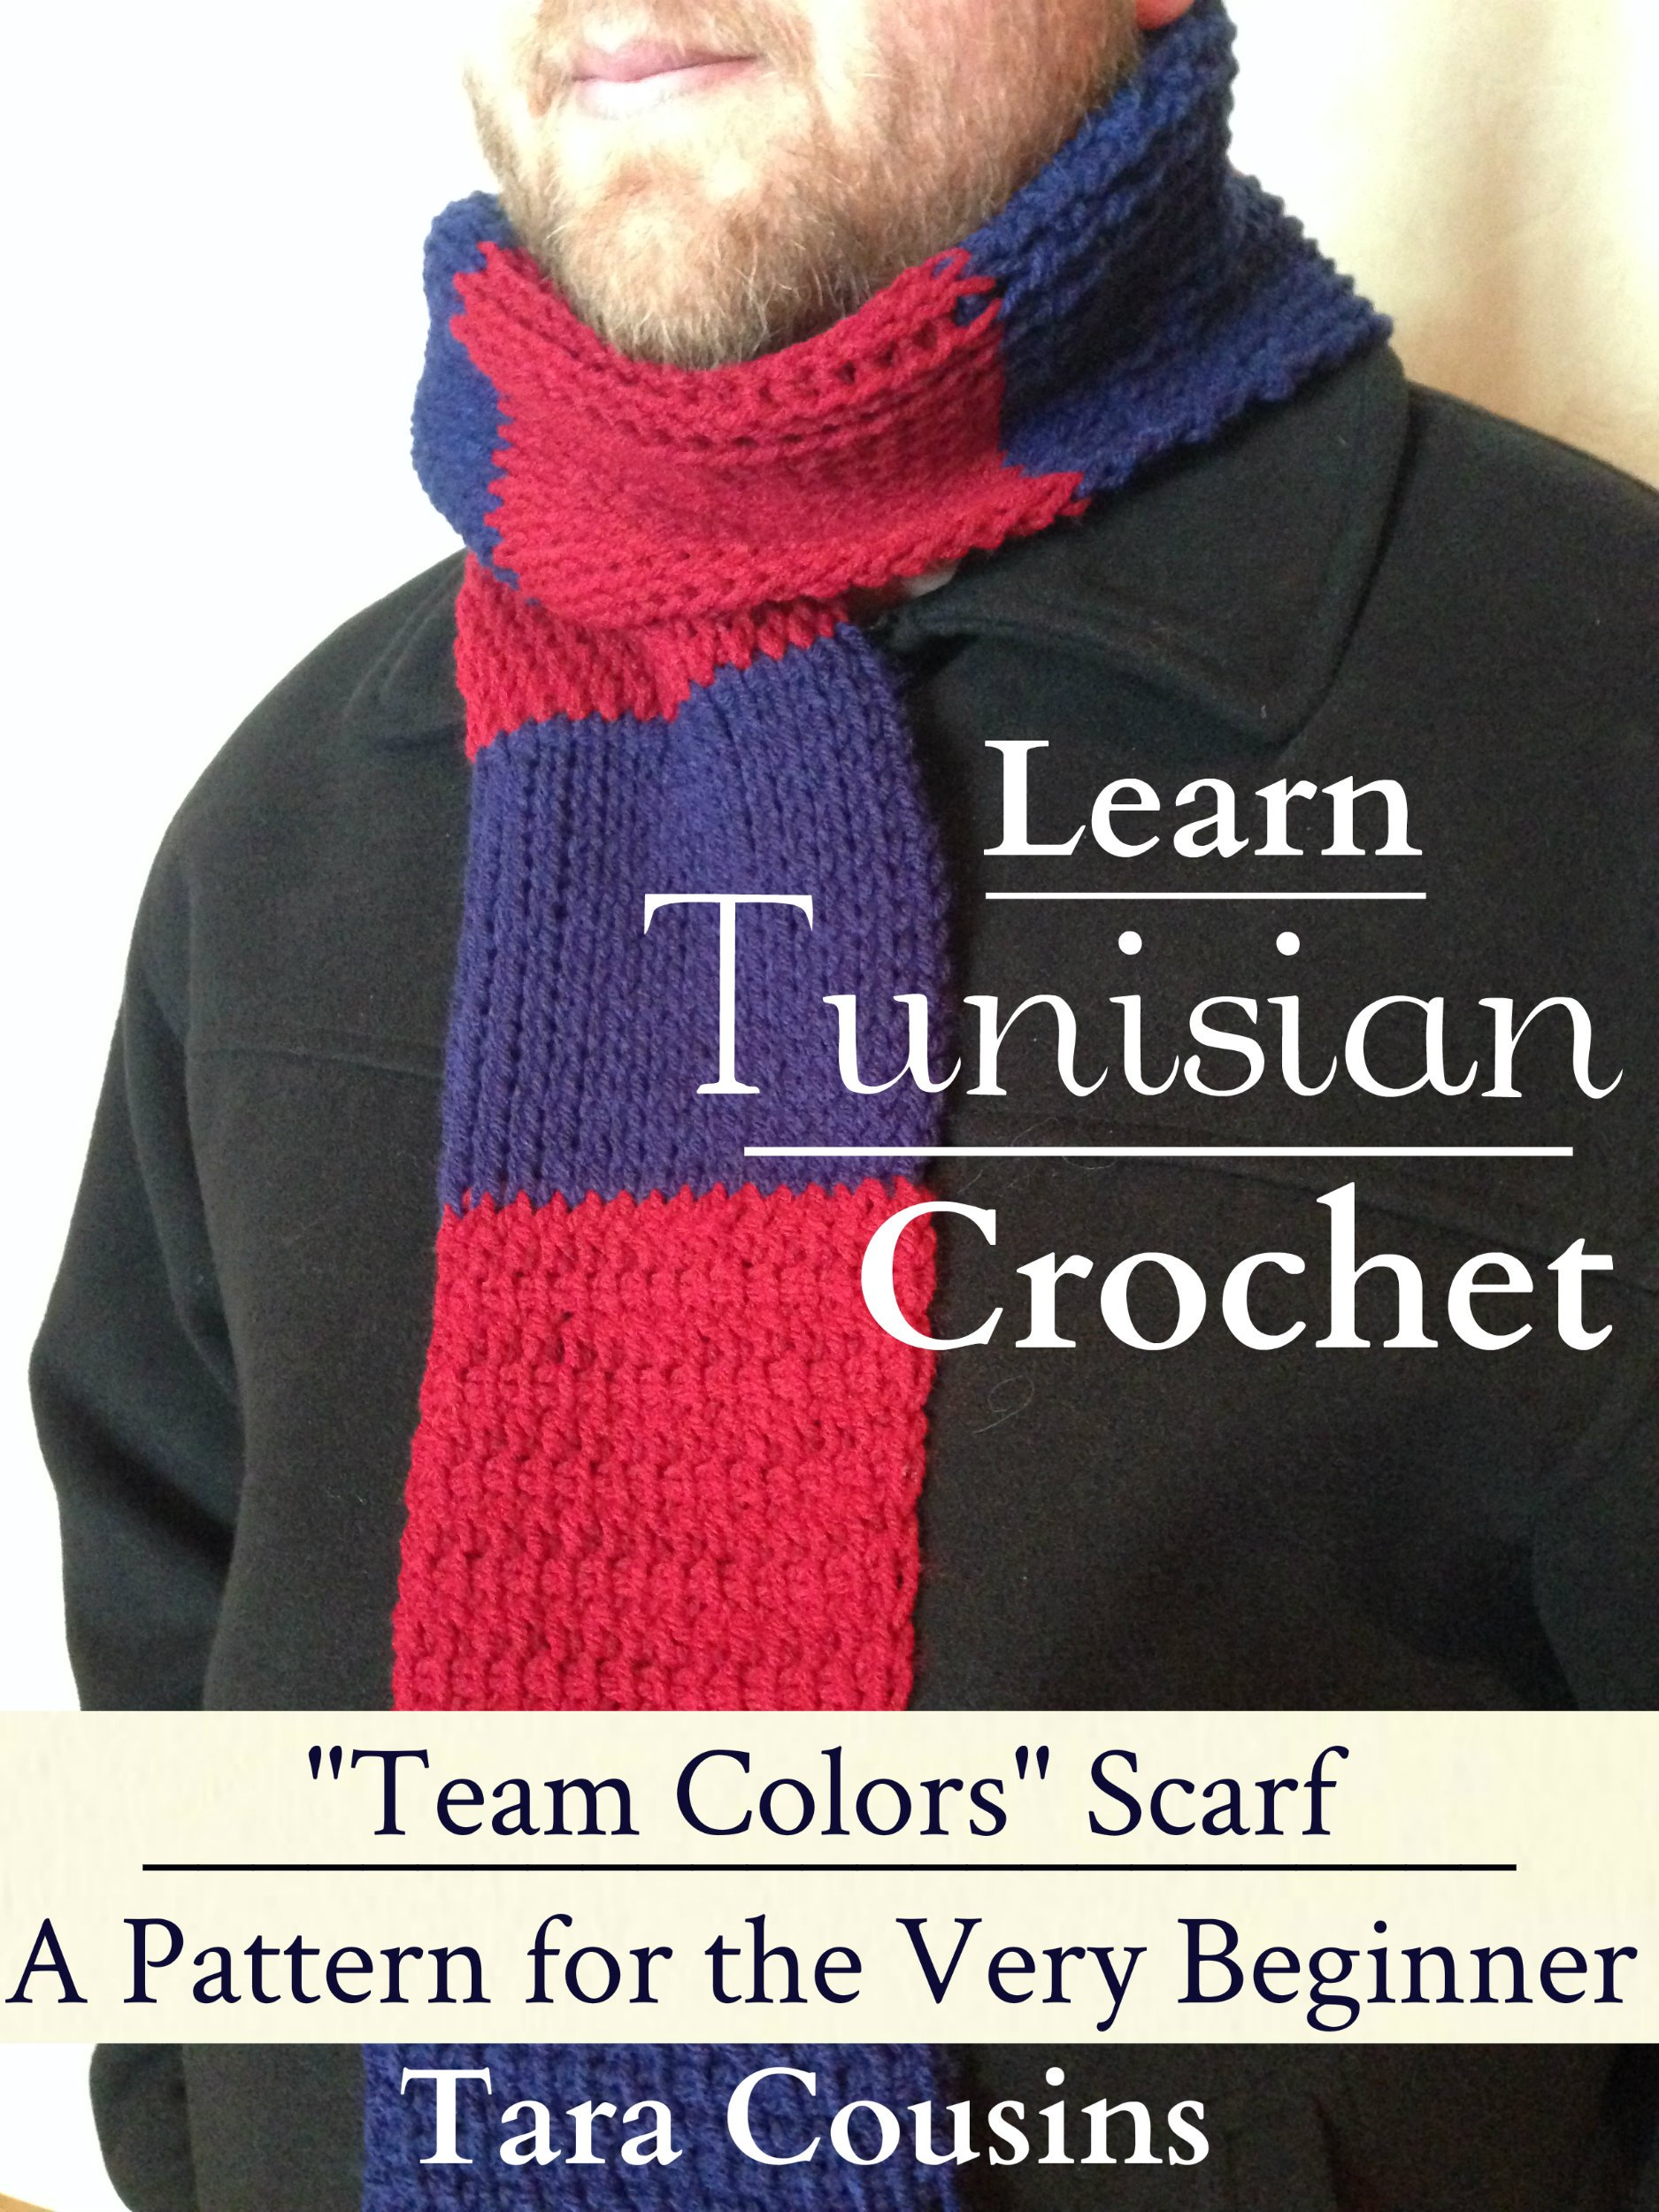 Crochet Team Scarf – Only New Crochet Patterns